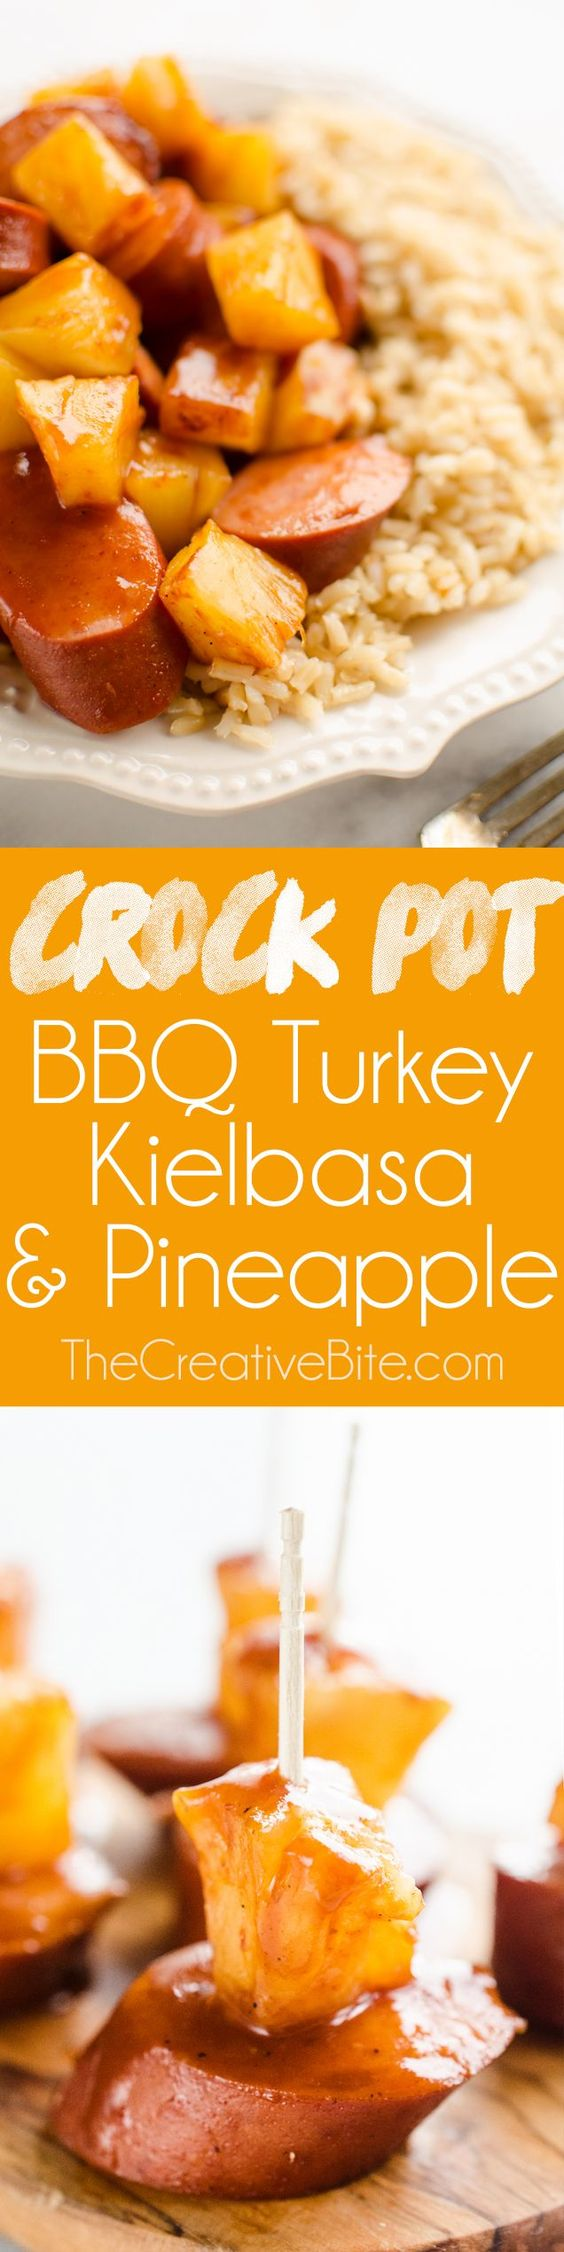 Keilbasa Appetizer Recipes Pineapple